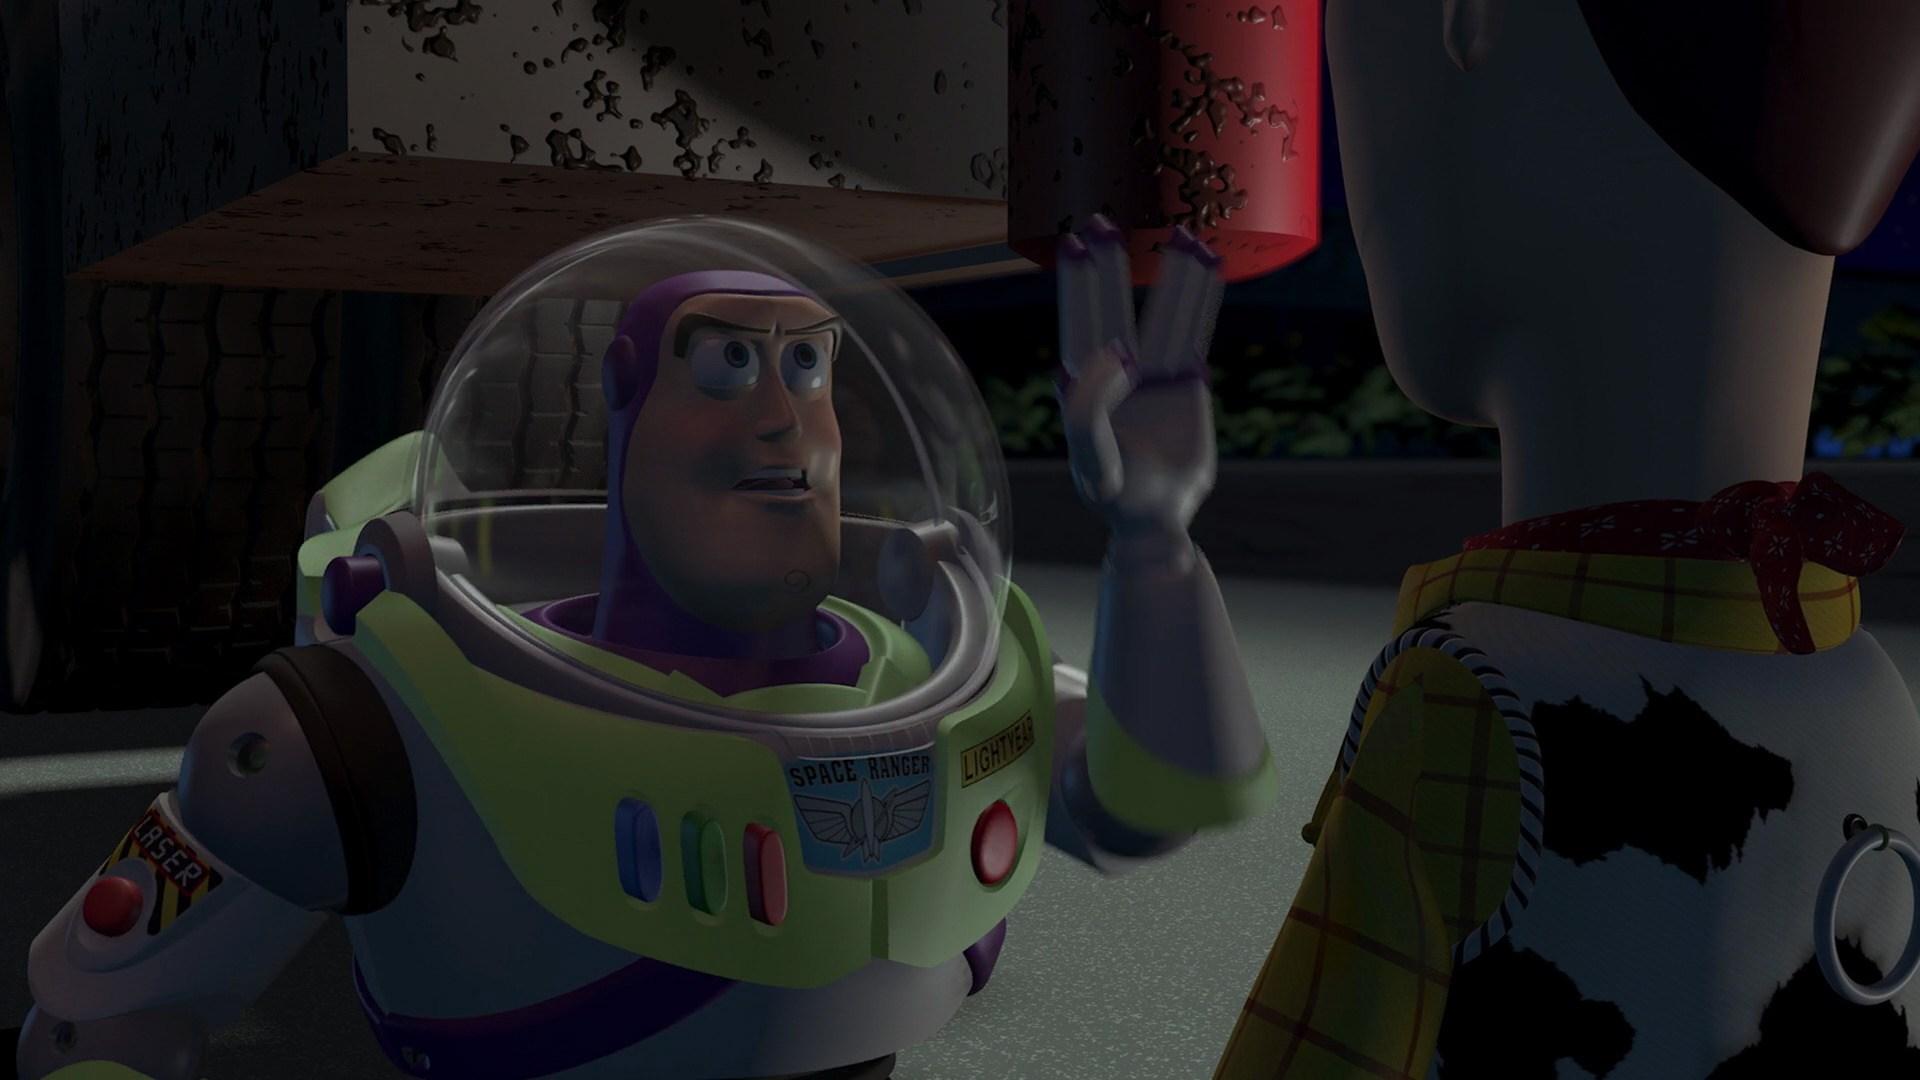 Star Trek References in Pixar Productions